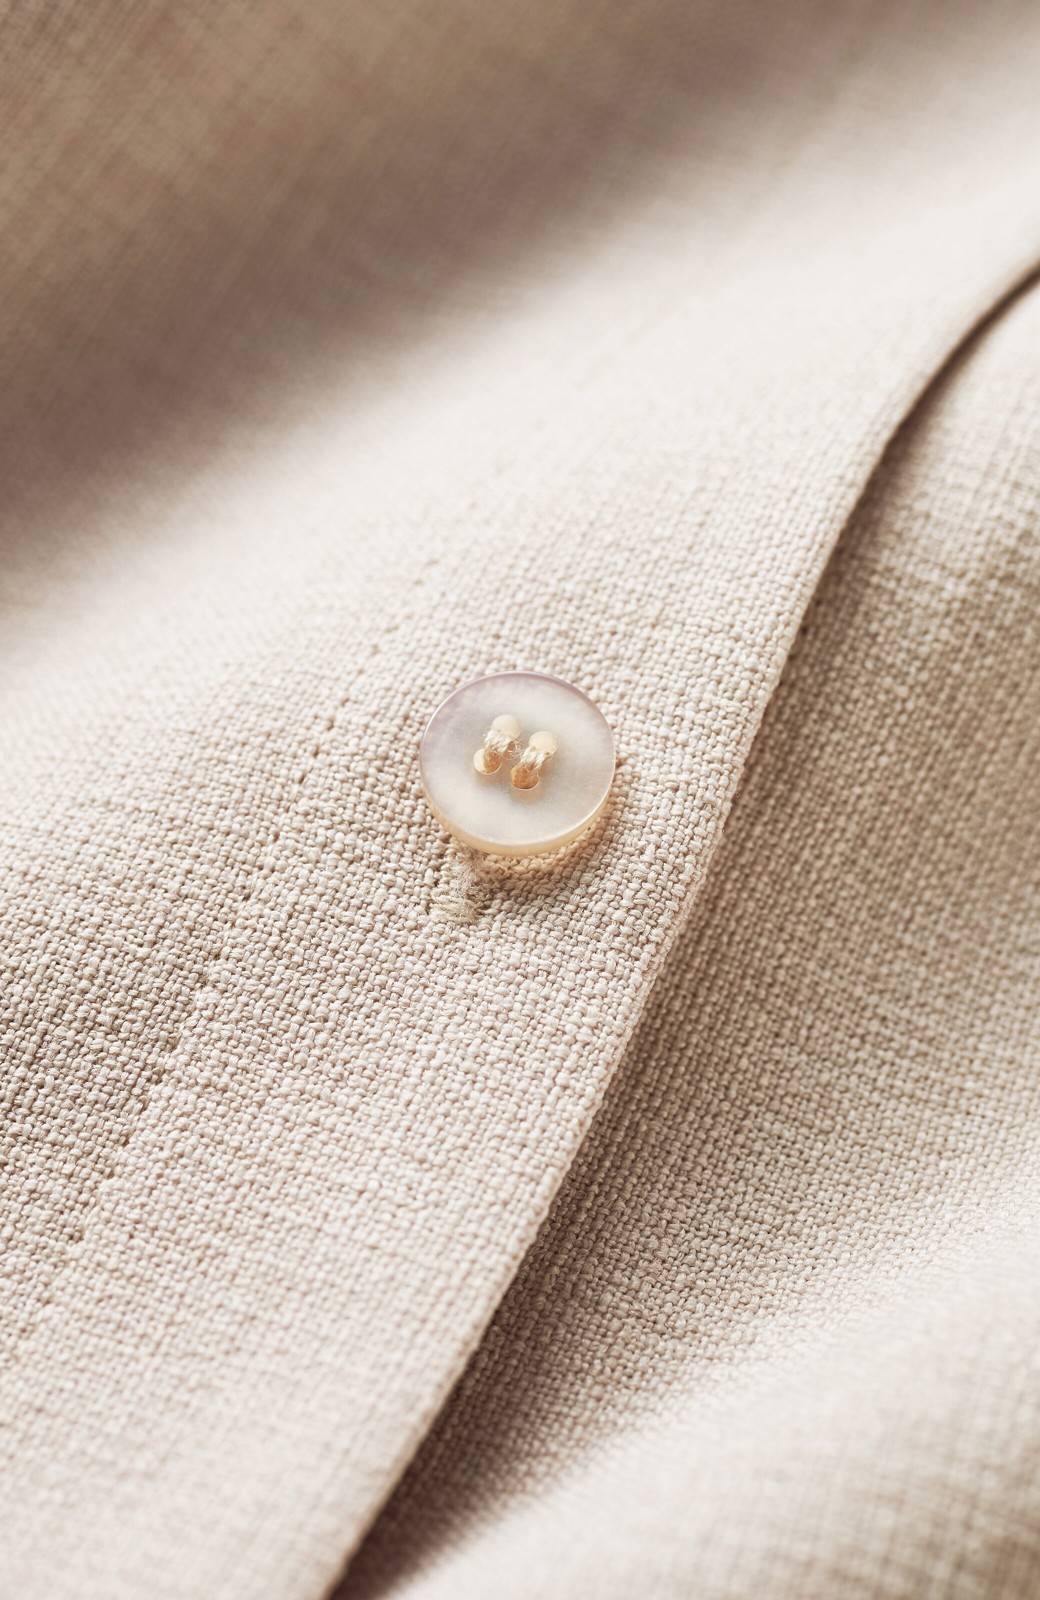 haco! 肩こり知らず!カーデぐらい気軽に羽織れる麻調素材のロングコート <ベージュ>の商品写真6